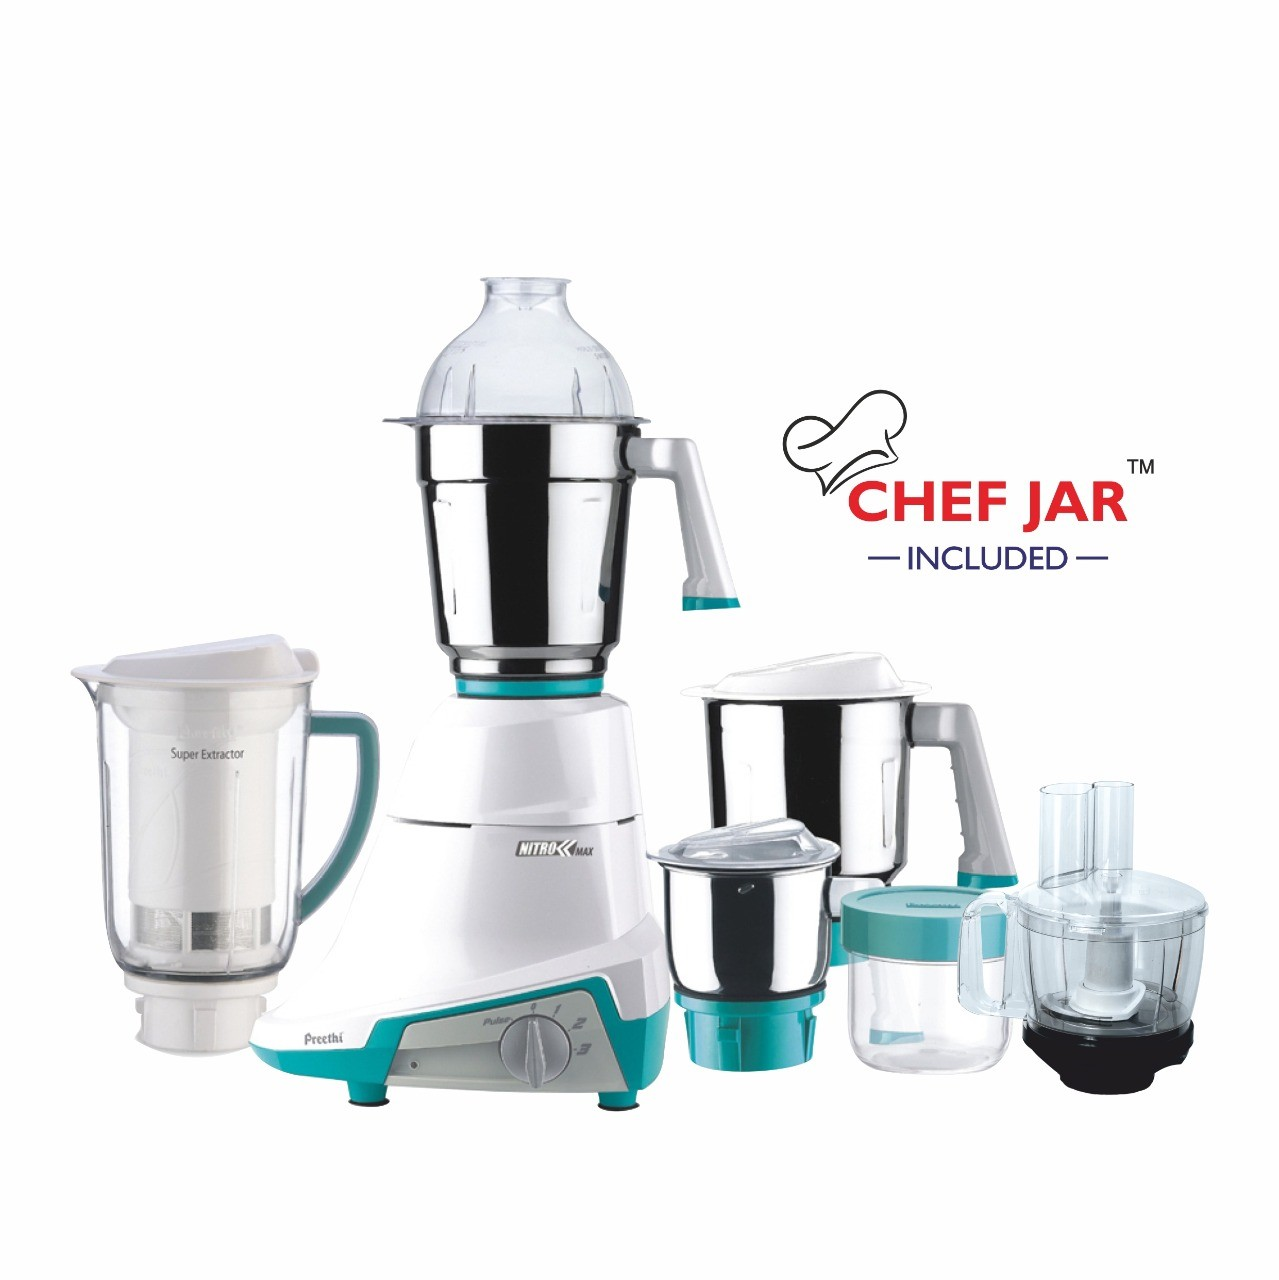 preethi-nitro-plus-chef-jar-juice-extractor-110v